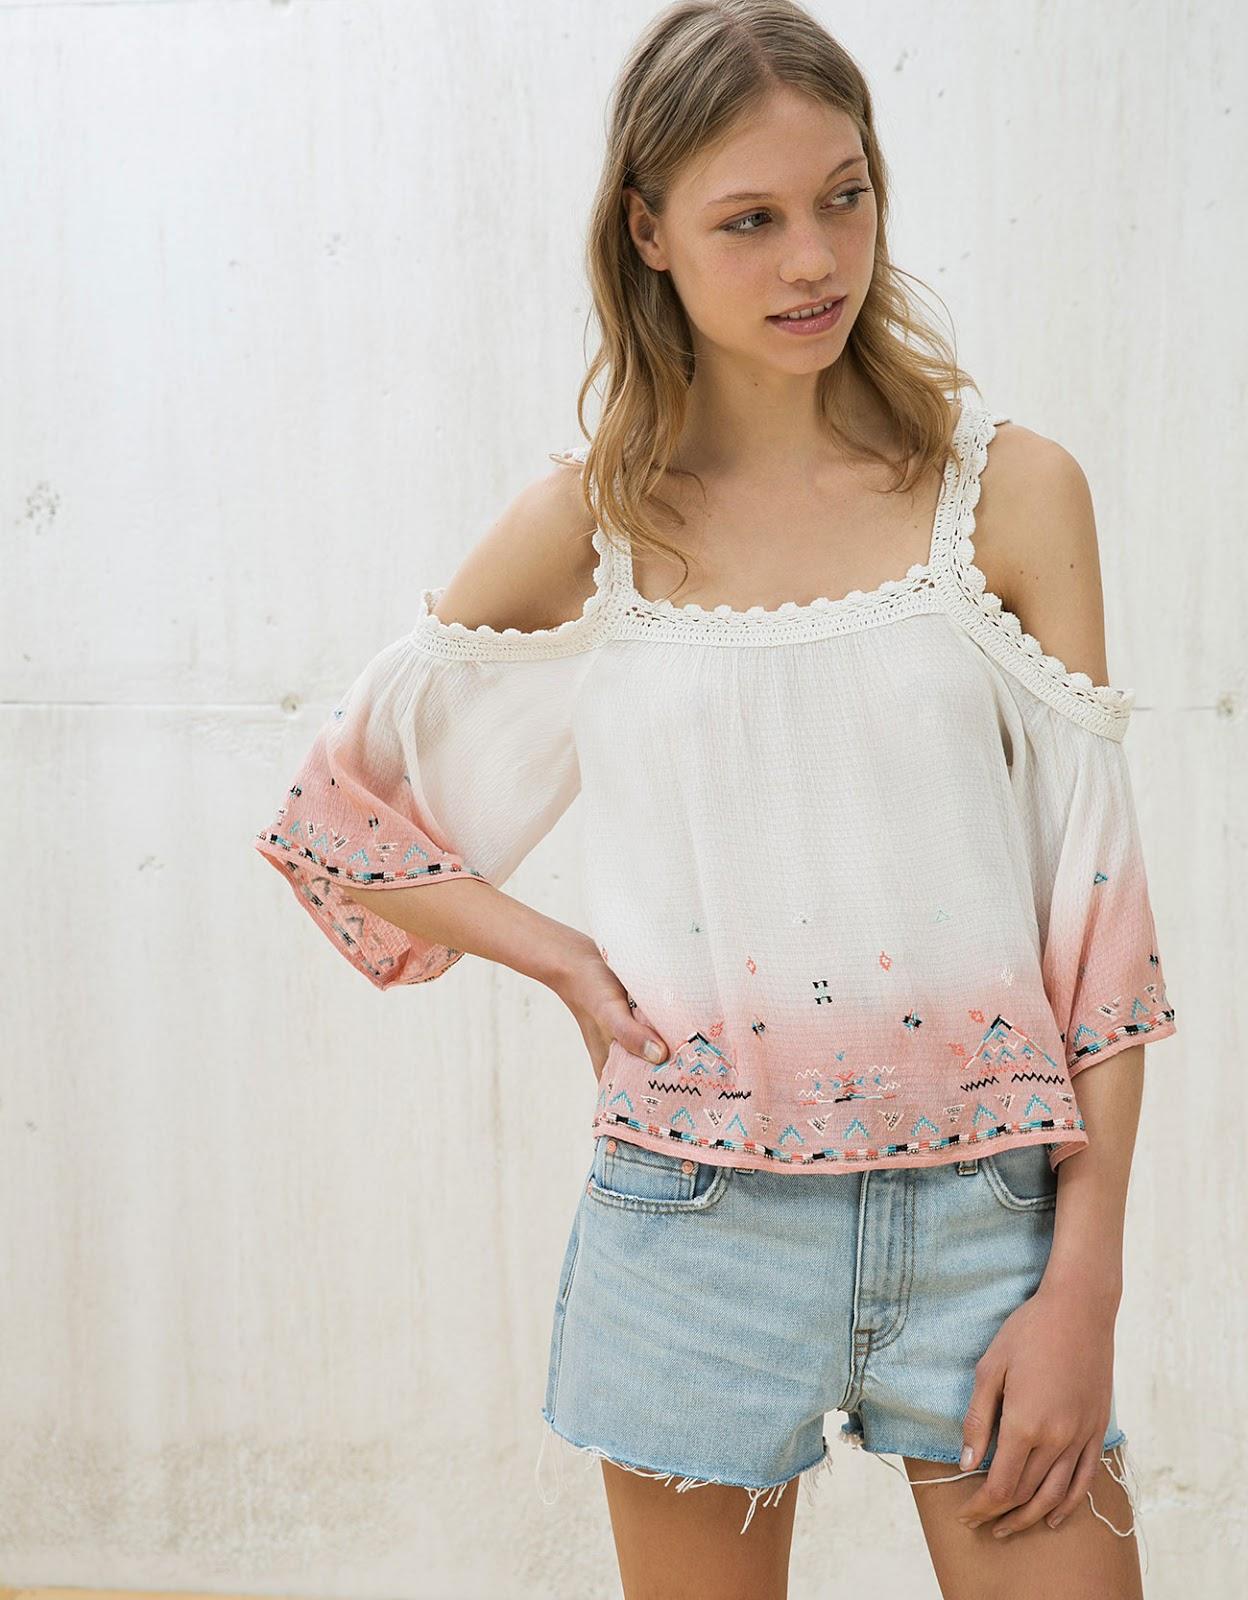 la moda me enamora 10 blusas de crochet para lucir rom ntica